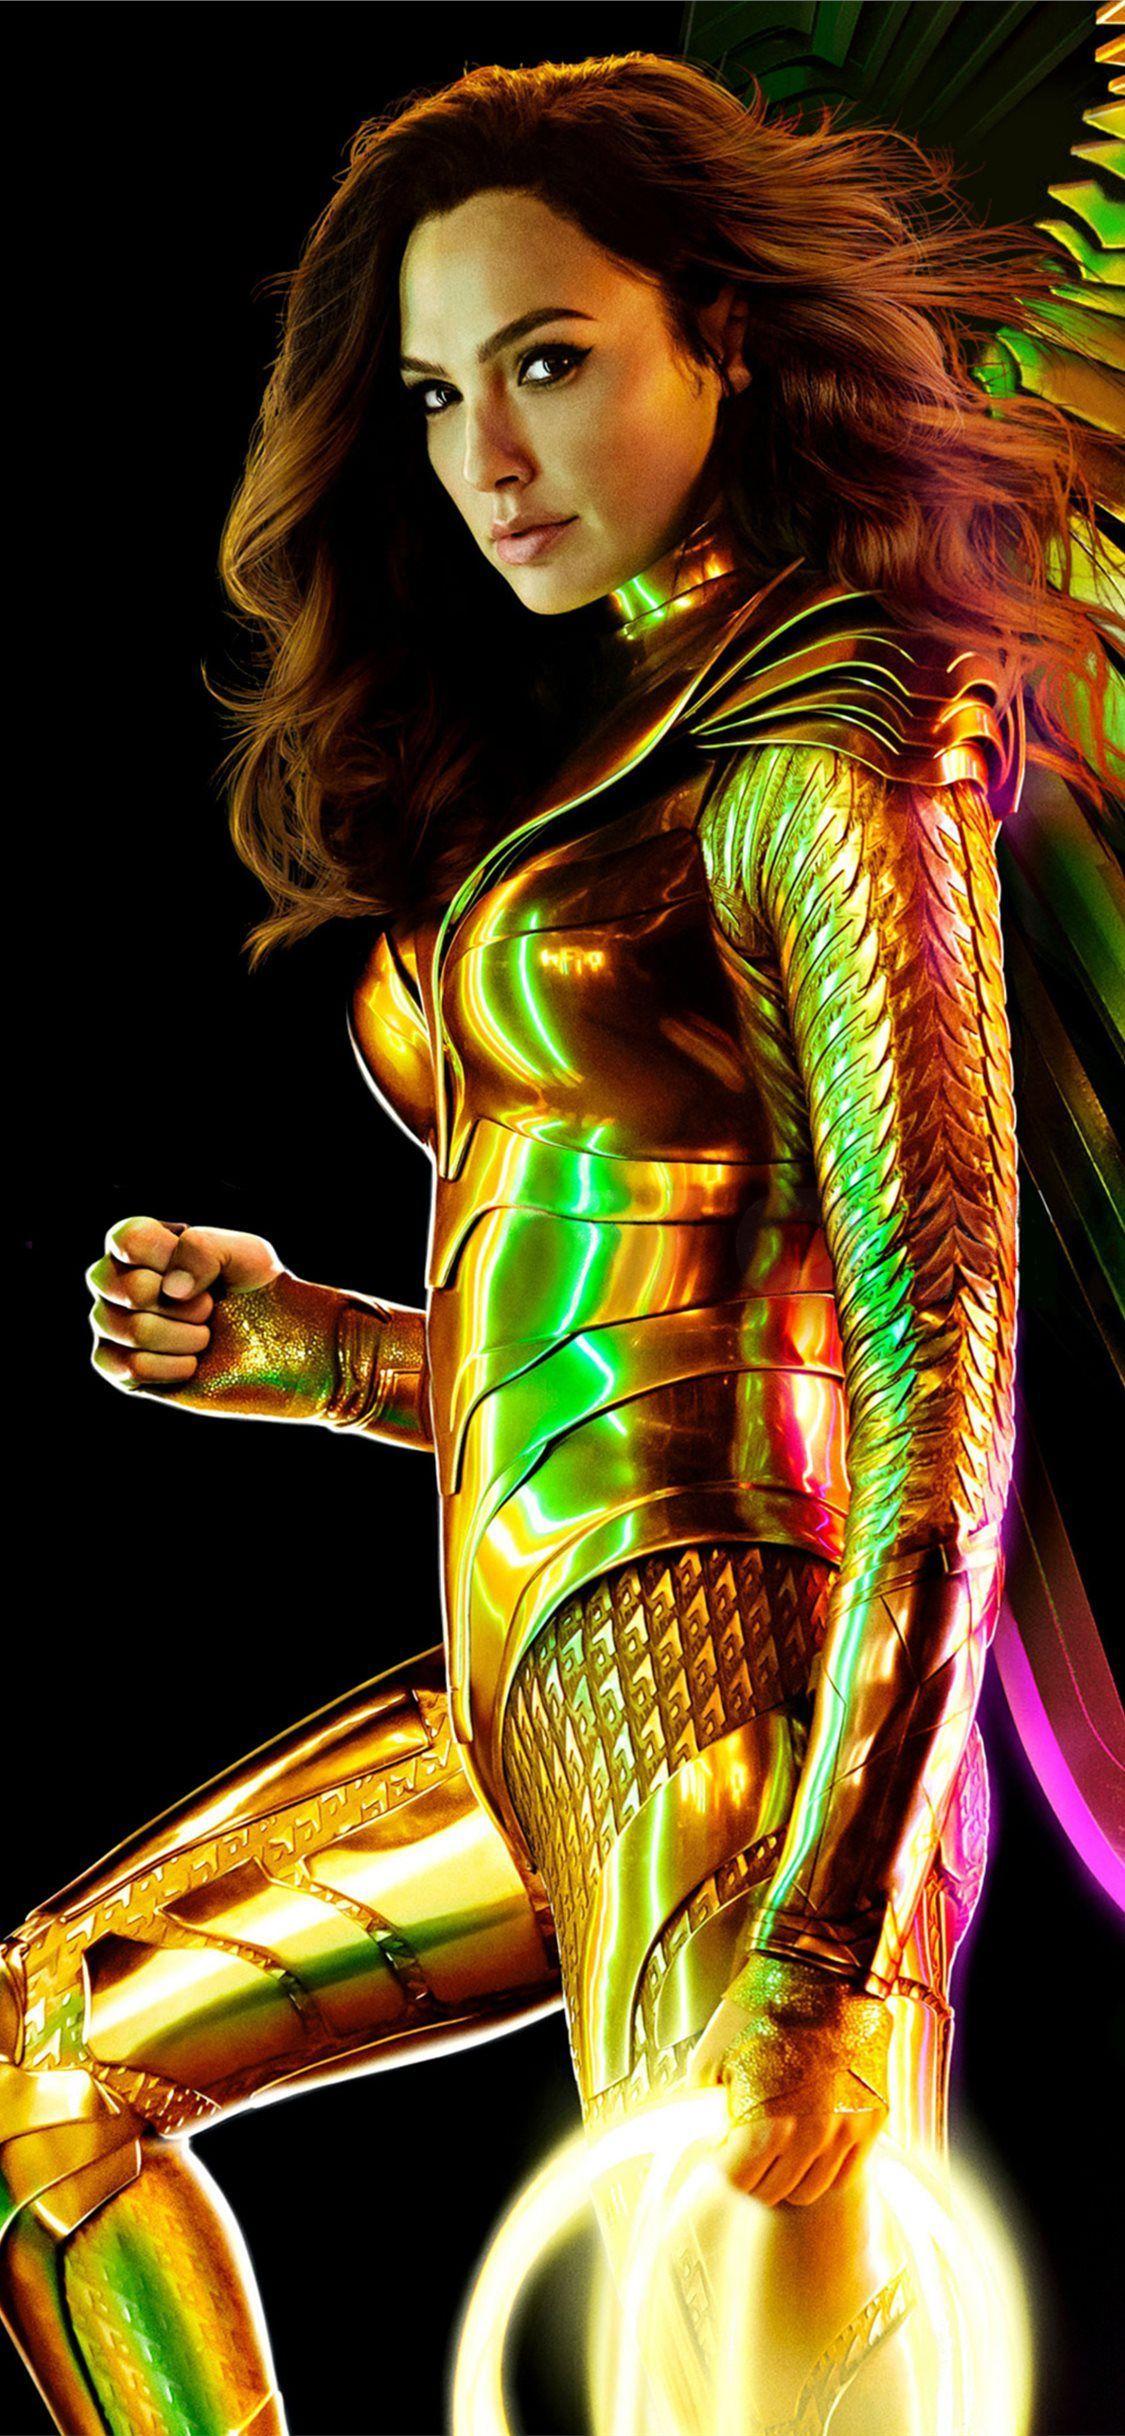 Wonder Woman 1984 4k 2020 Wonder Woman 1984 Wonder Woman 2 Wonder Woman Movies 2020 Movies In 2020 Gal Gadot Wonder Woman Wonder Woman Movie Wonder Woman Artwork